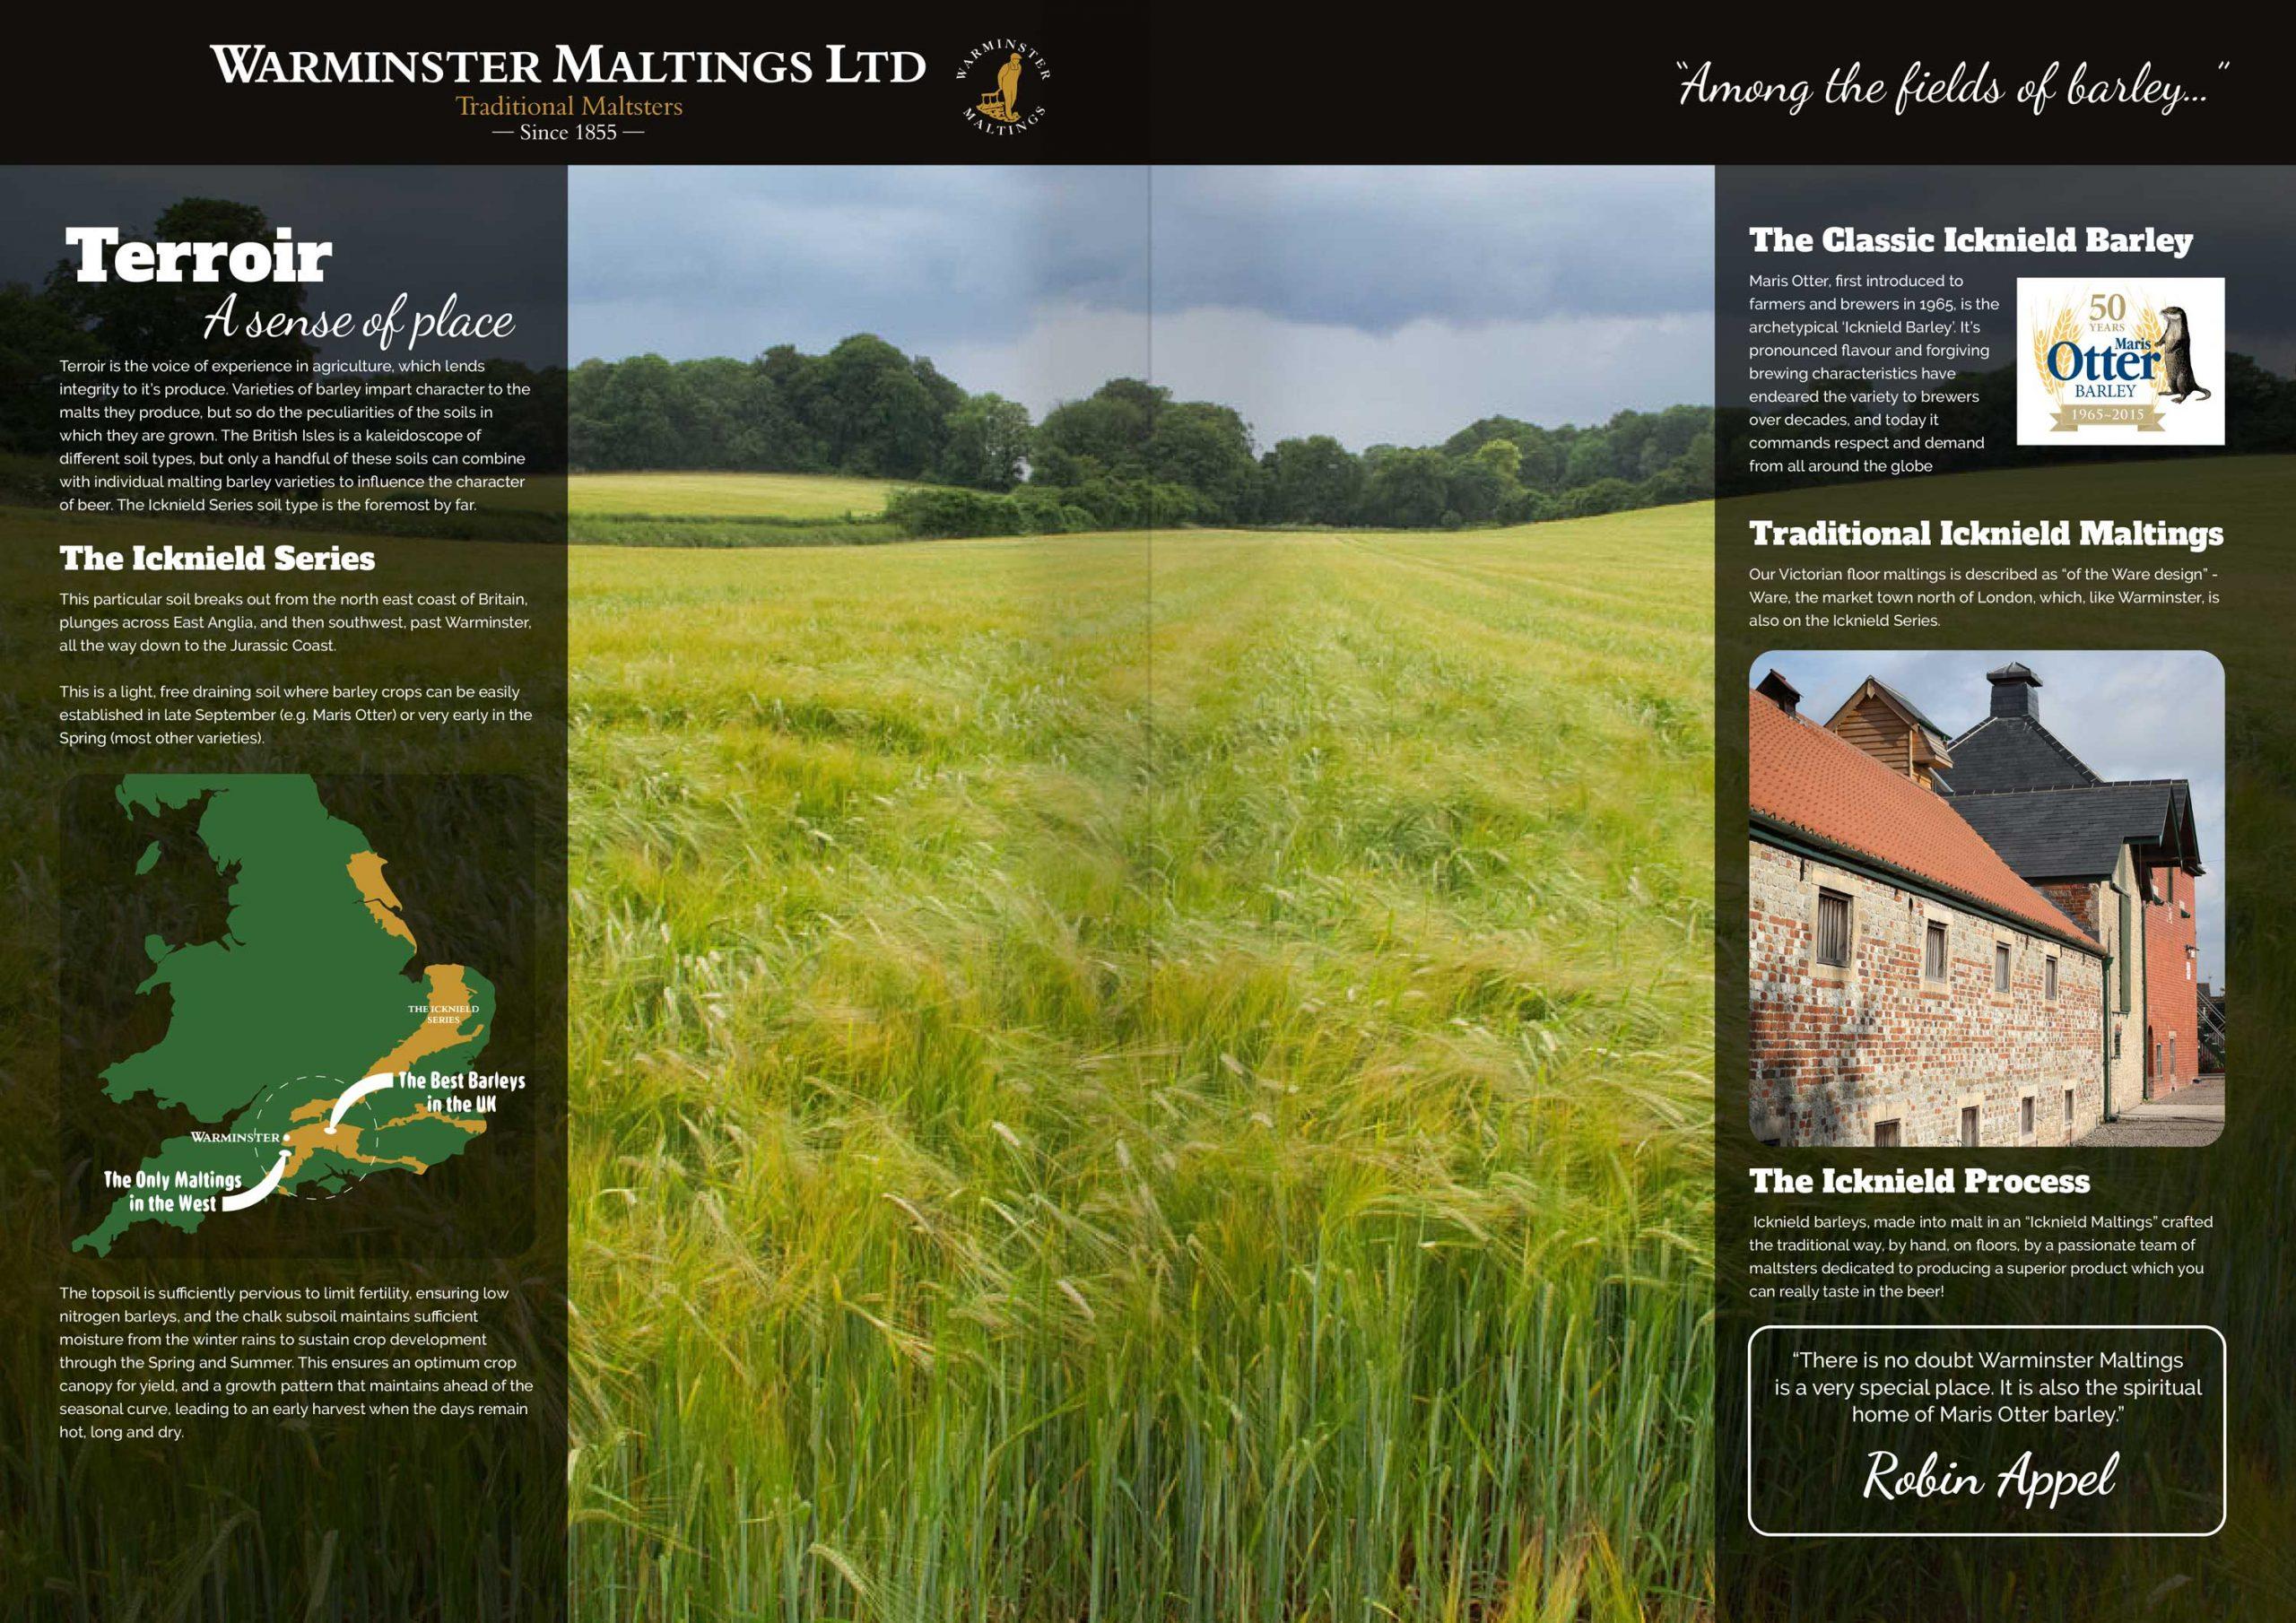 Warminster Maltings - Terroir a sense of place